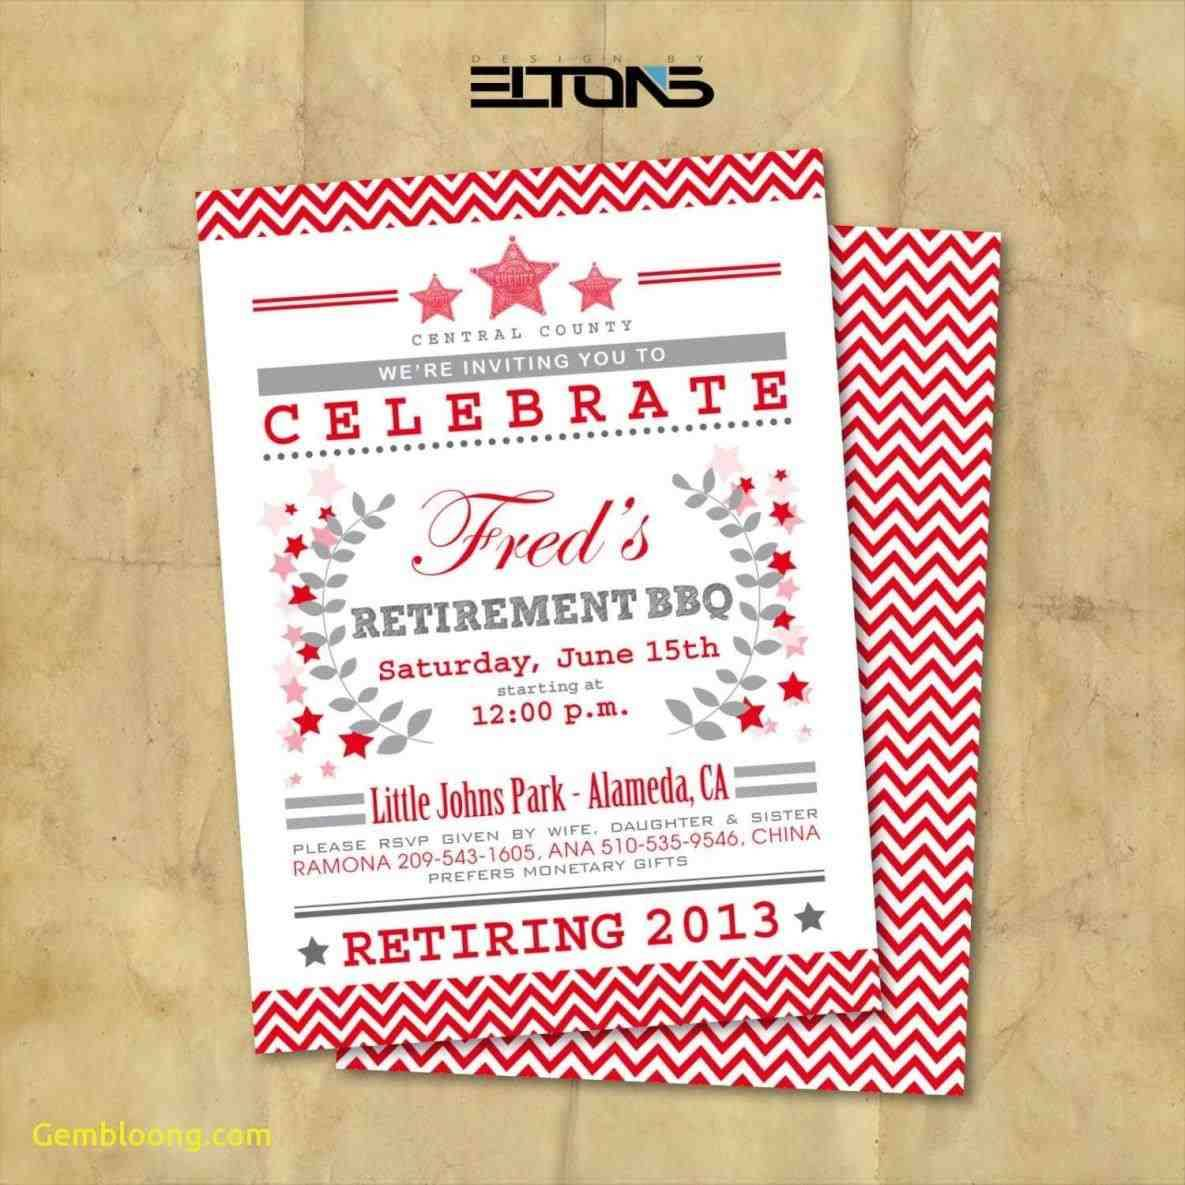 Retirement Celebration Invitation Templates